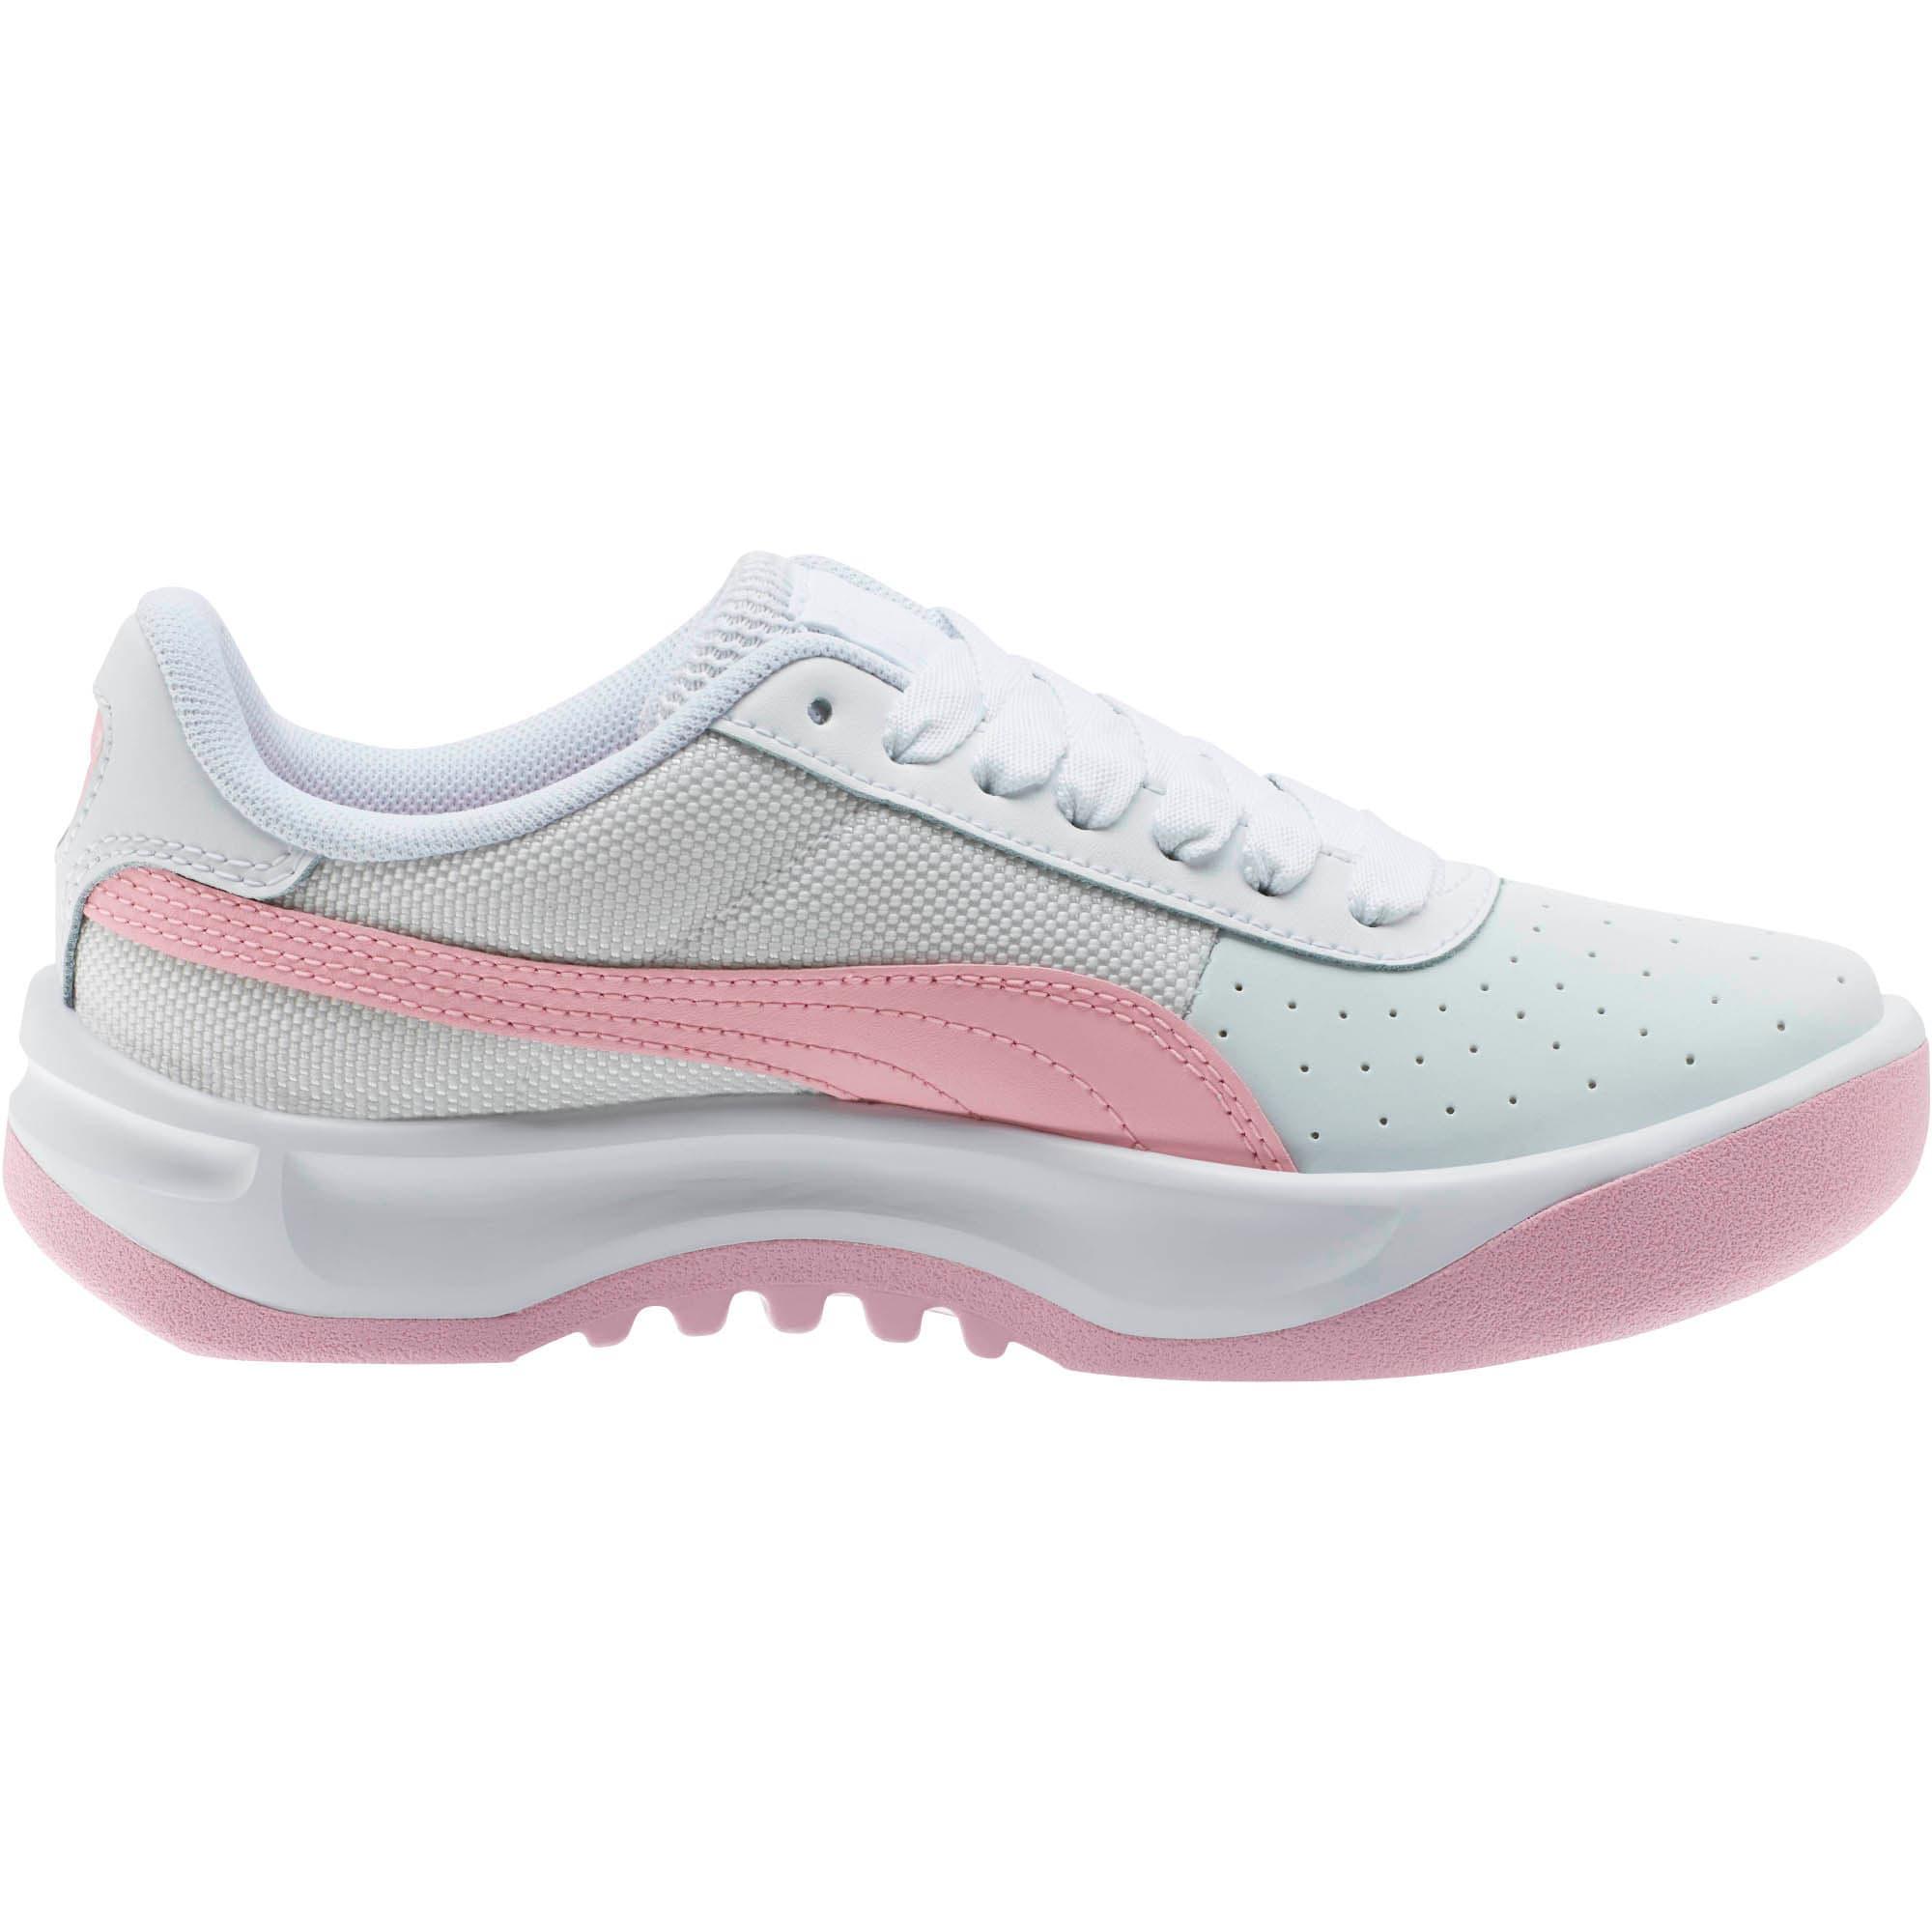 Thumbnail 4 of California Sneakers JR, Puma Wht-Pale Pink-Puma Wht, medium